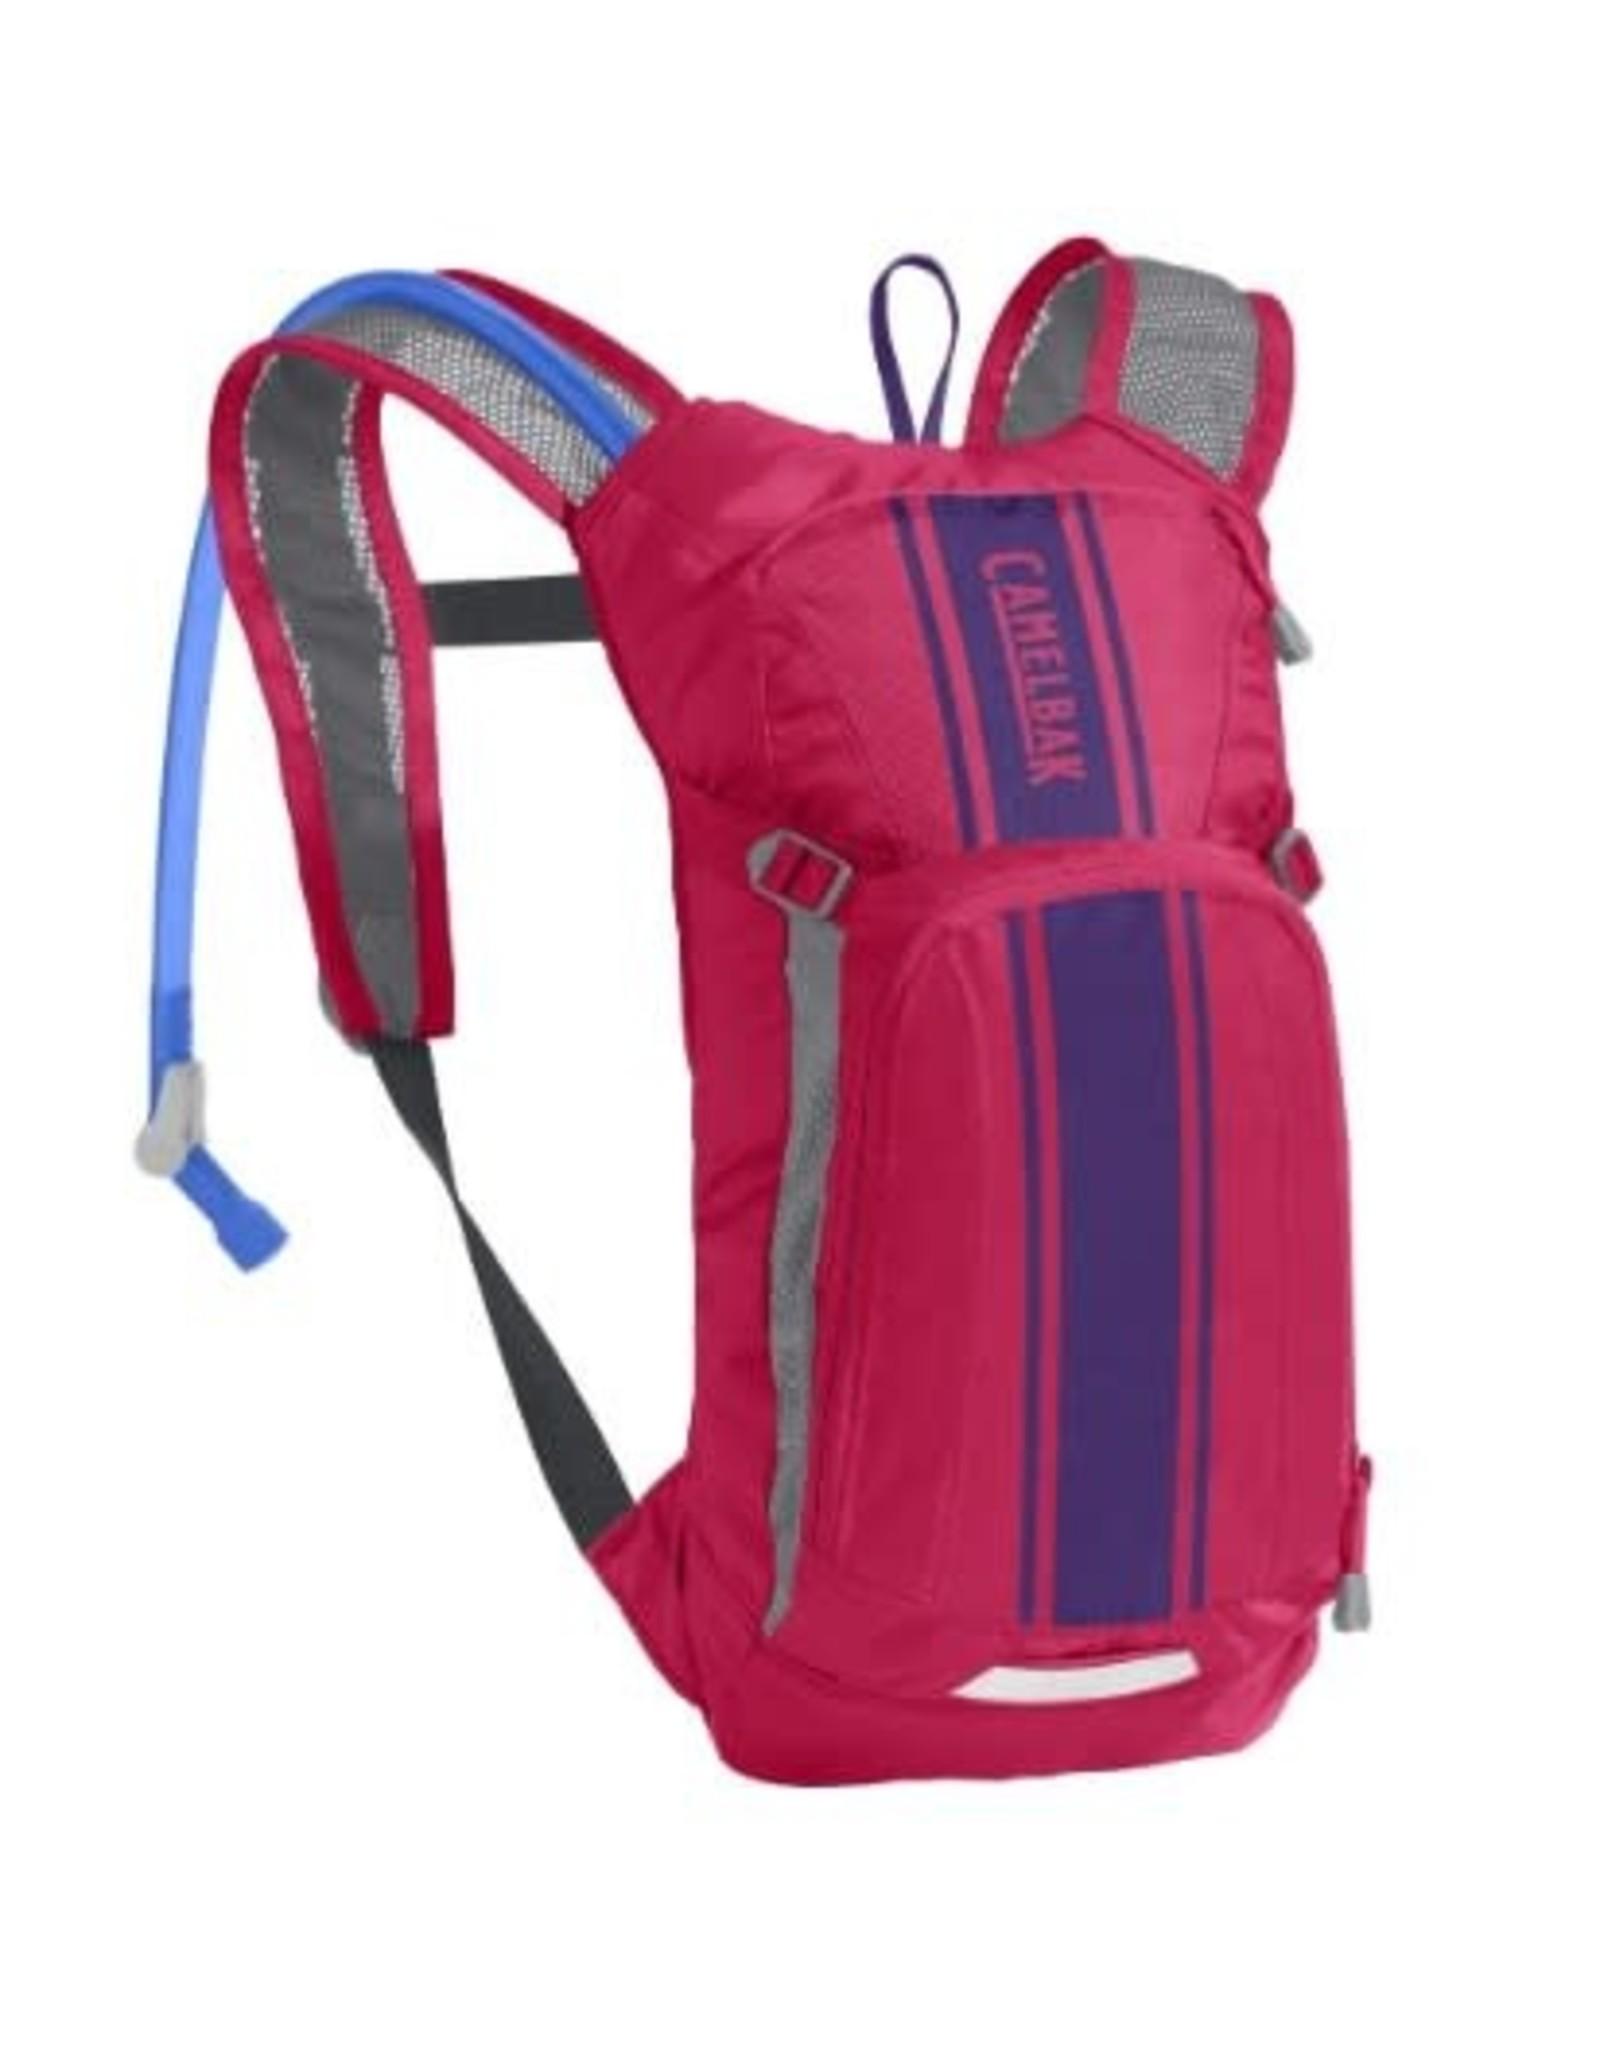 Camelbak Hydratation bag Camelbak Mini MULE 50oz/1.5L